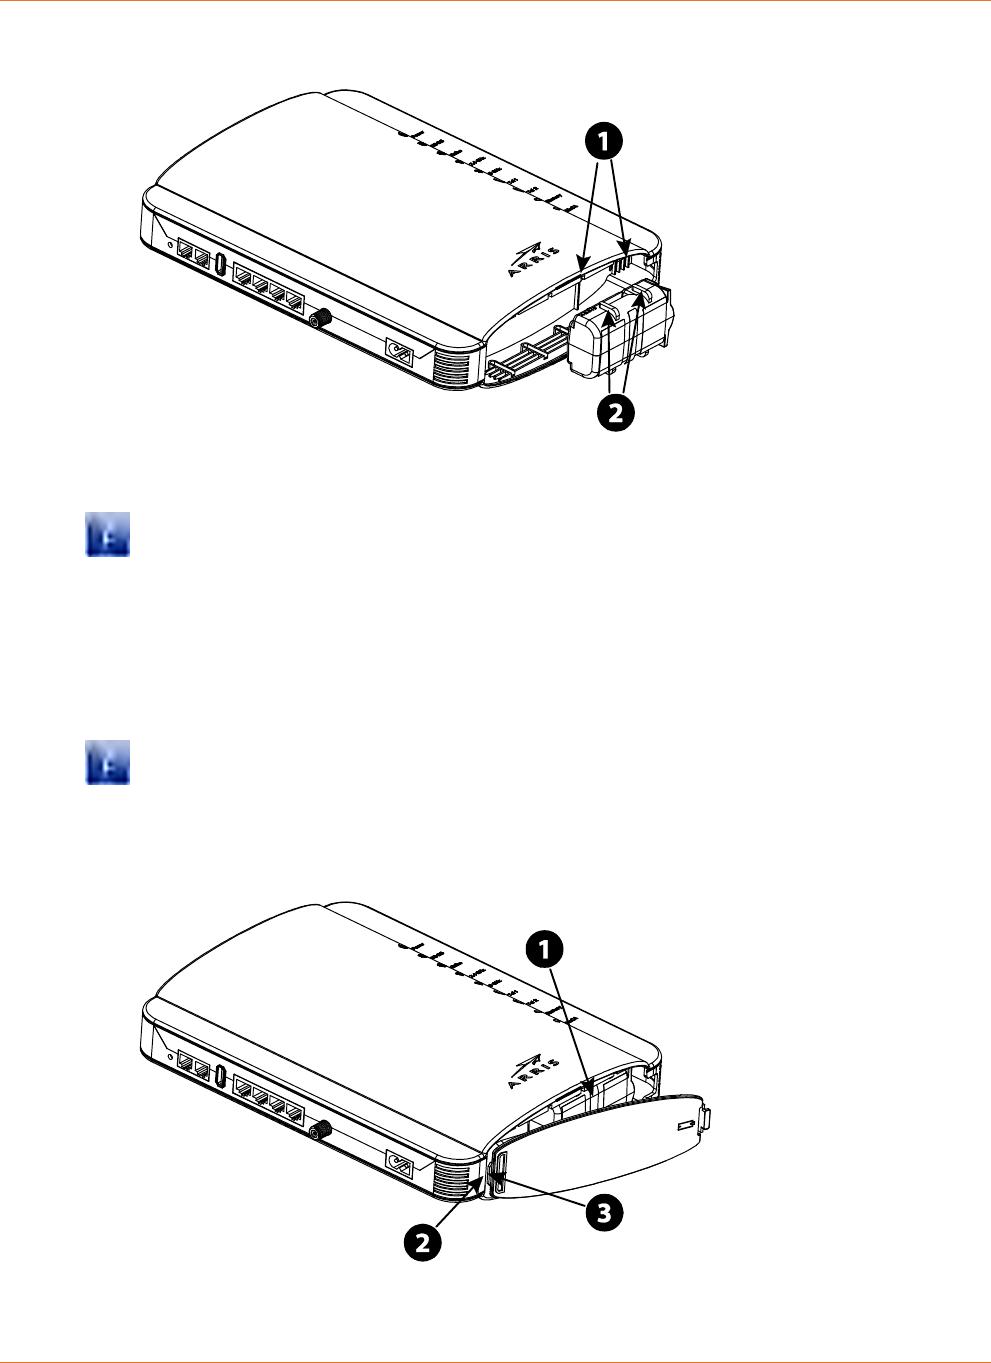 ARRIS Group TG1652 Touchstone Wireless Telephony Gateway